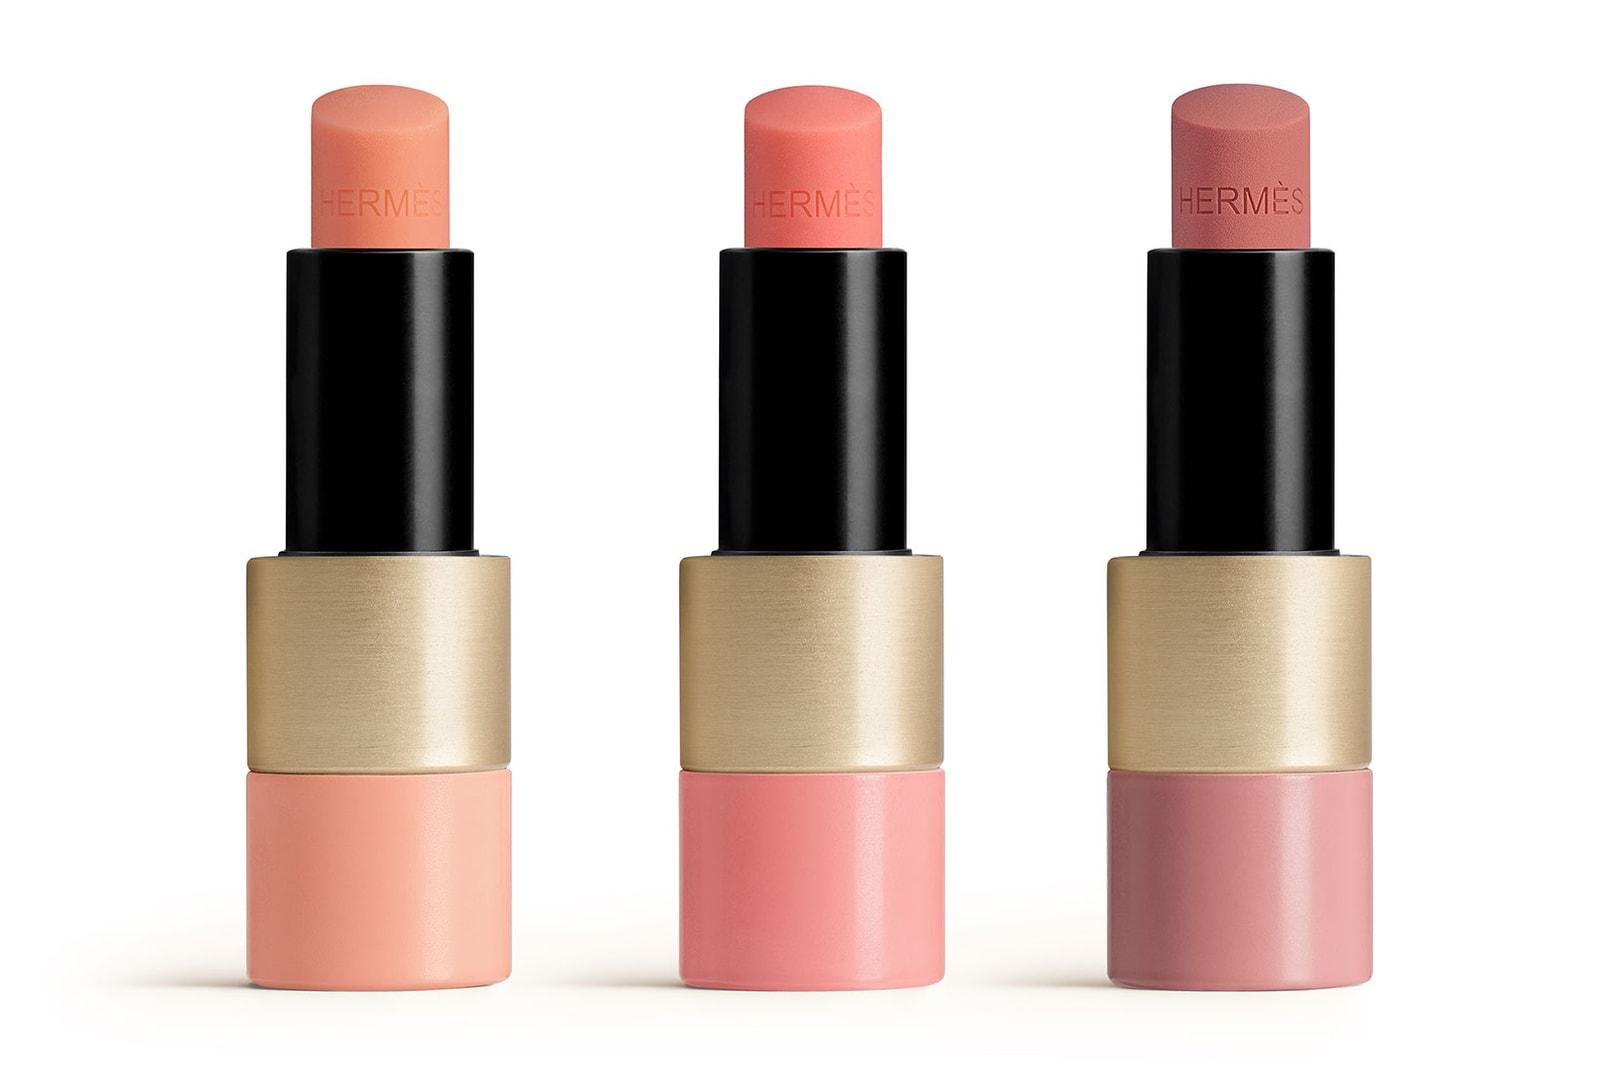 hermes beauty rose silky blushes pommette cases lip enhancers makeup brushes sustainable